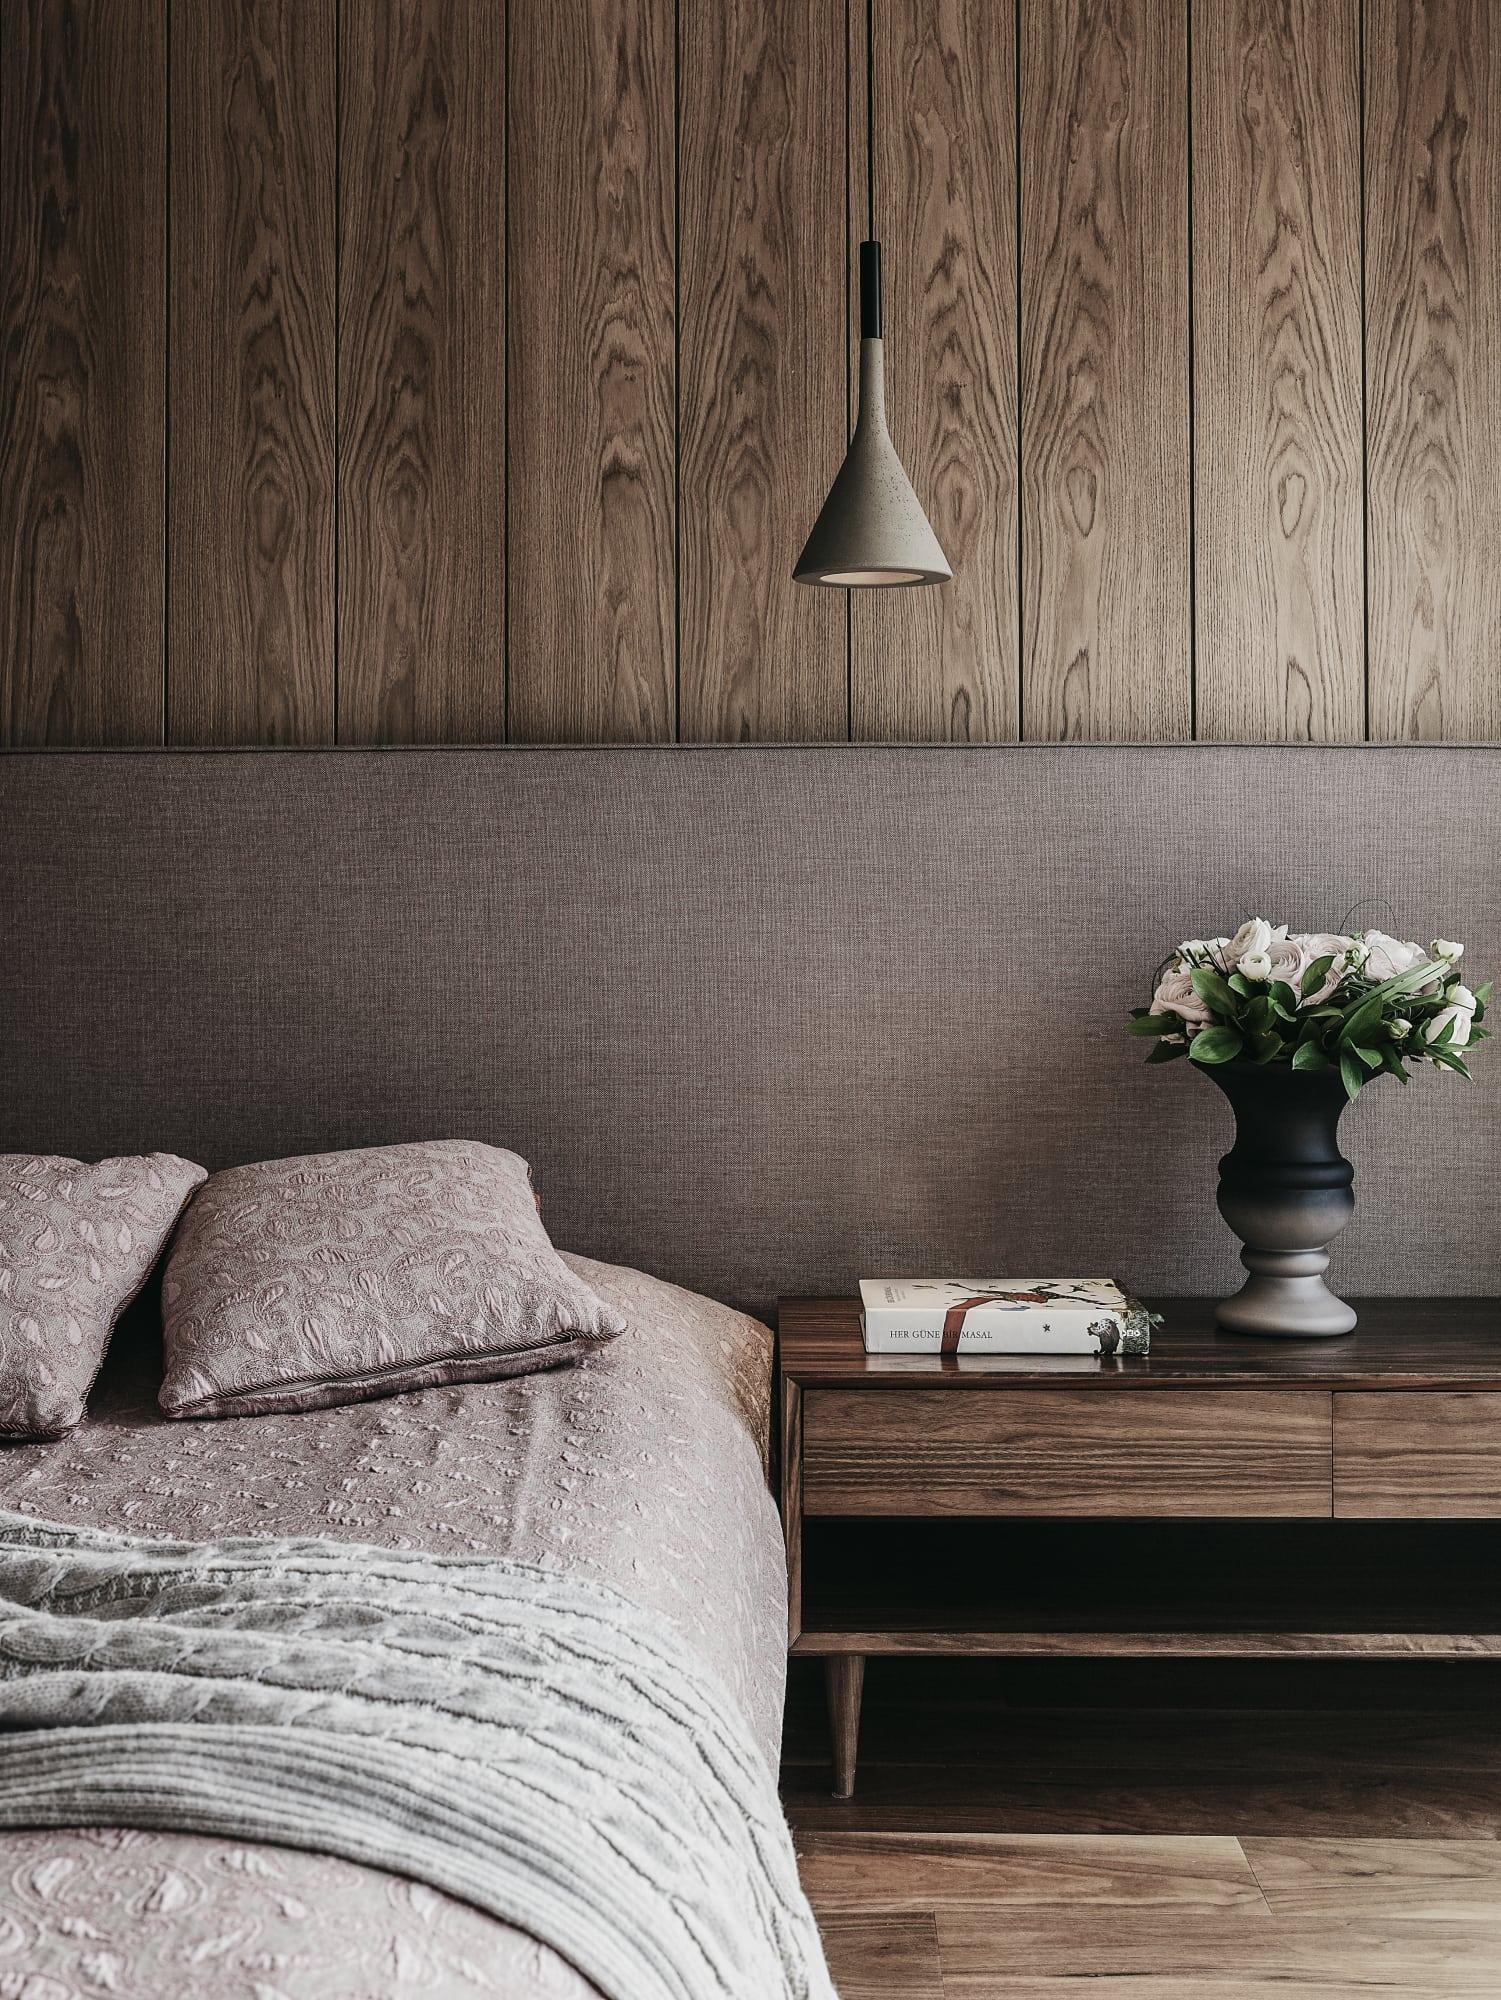 dọn dẹp nhà 5 phút-ed tips-elledecoration vn